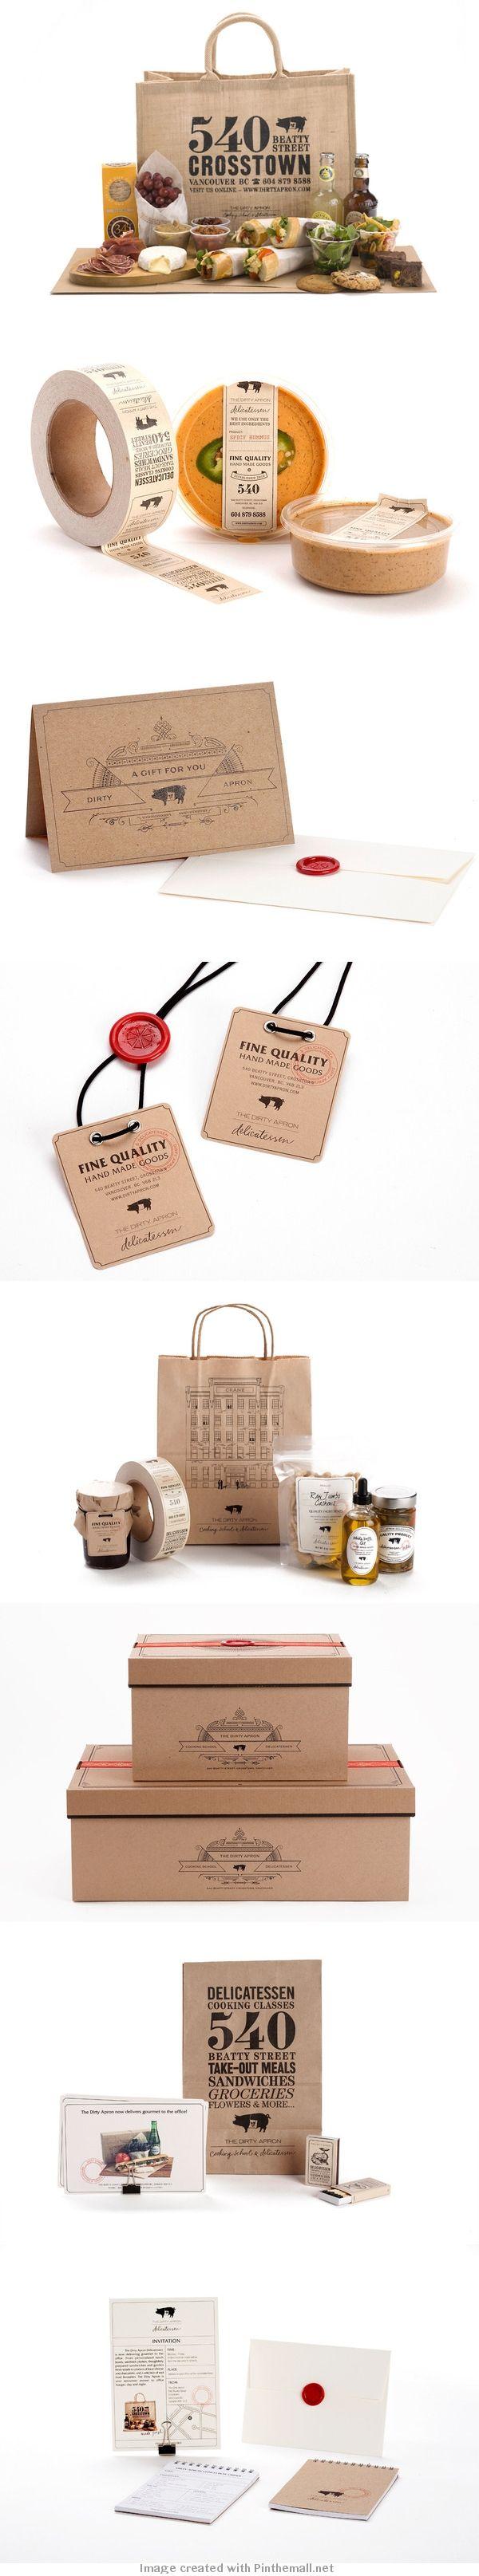 The Dirty Apron Delicatessen   Branding via Behance